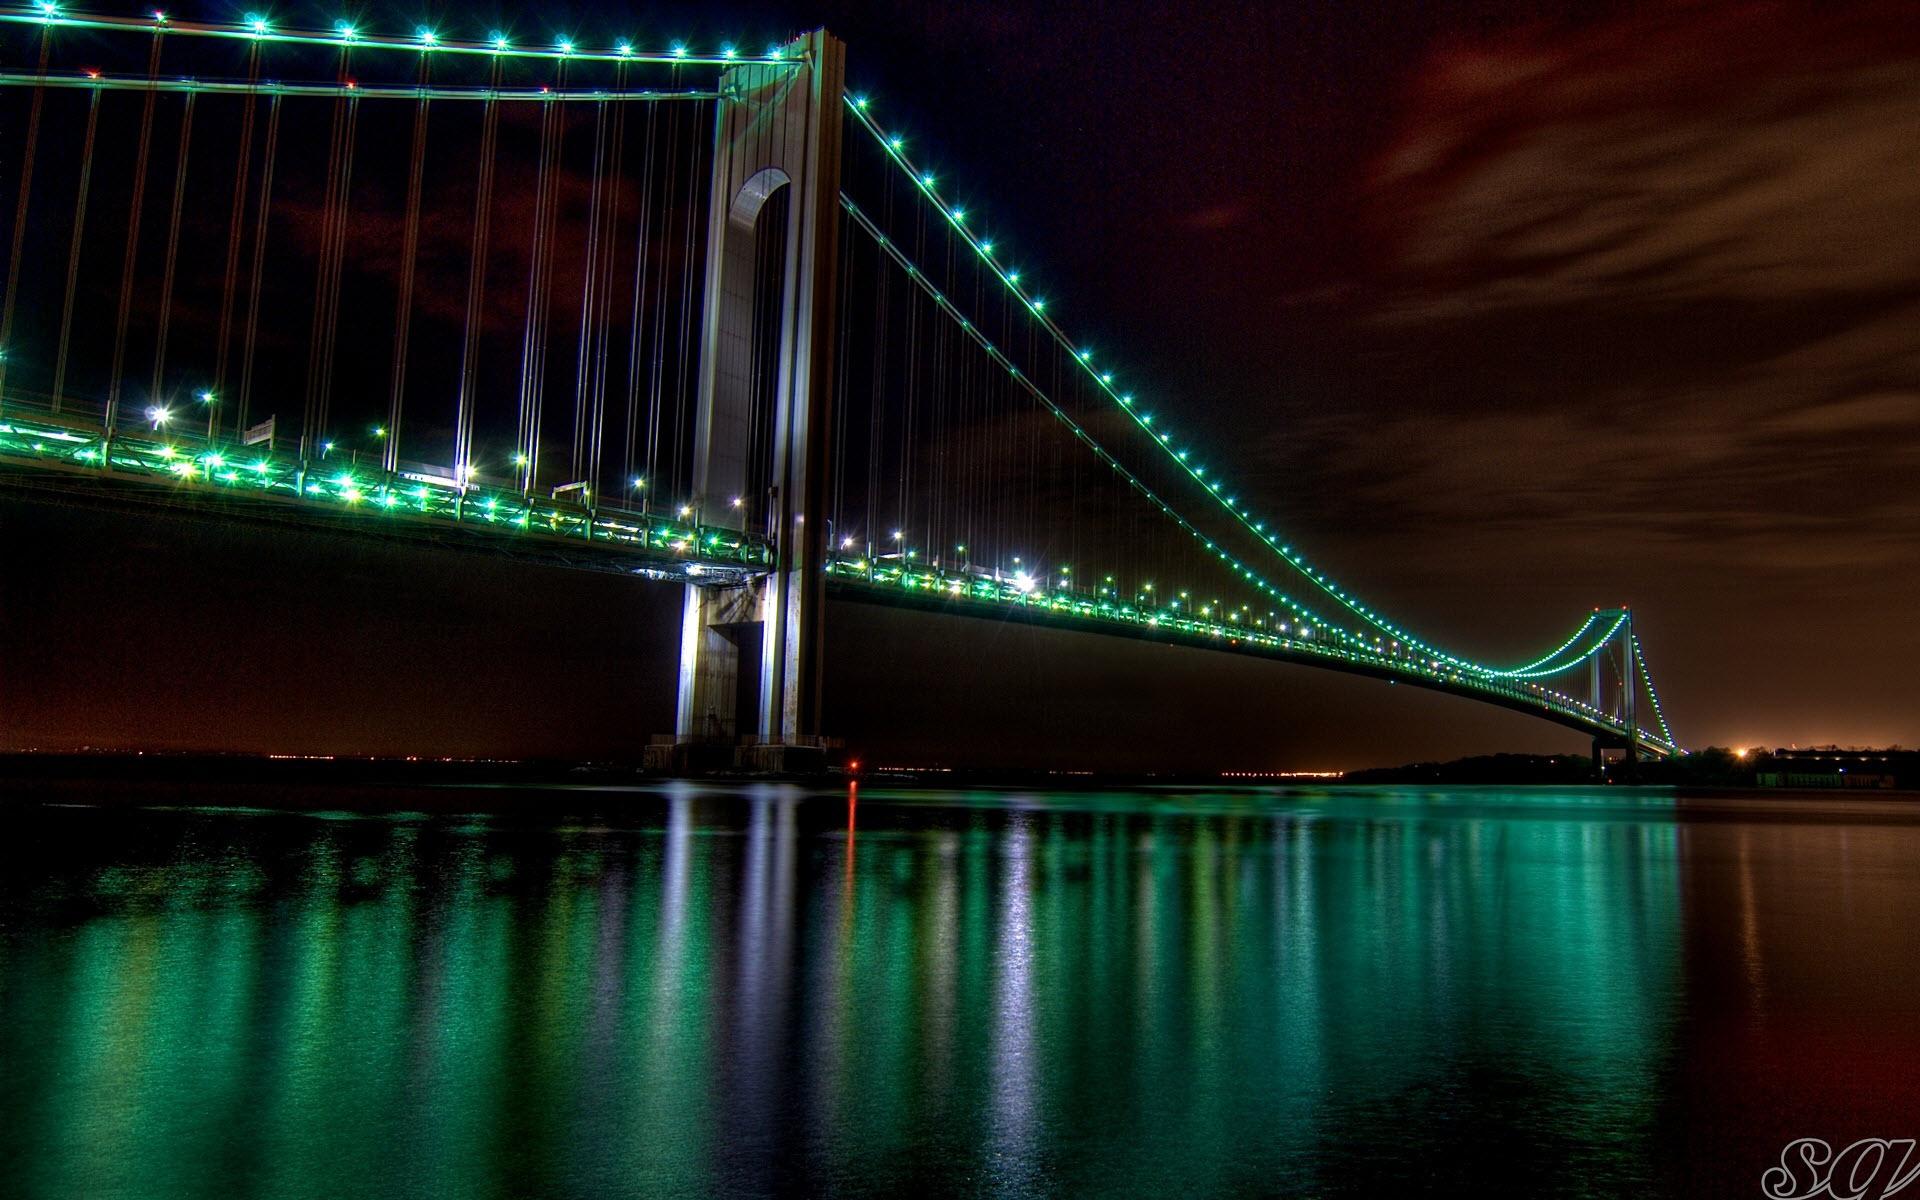 Good Wallpaper Night Golden Gate Bridge - The%20Golden%20Gate%20Bridge%20Night%20View1569113989  Trends-761077.jpg